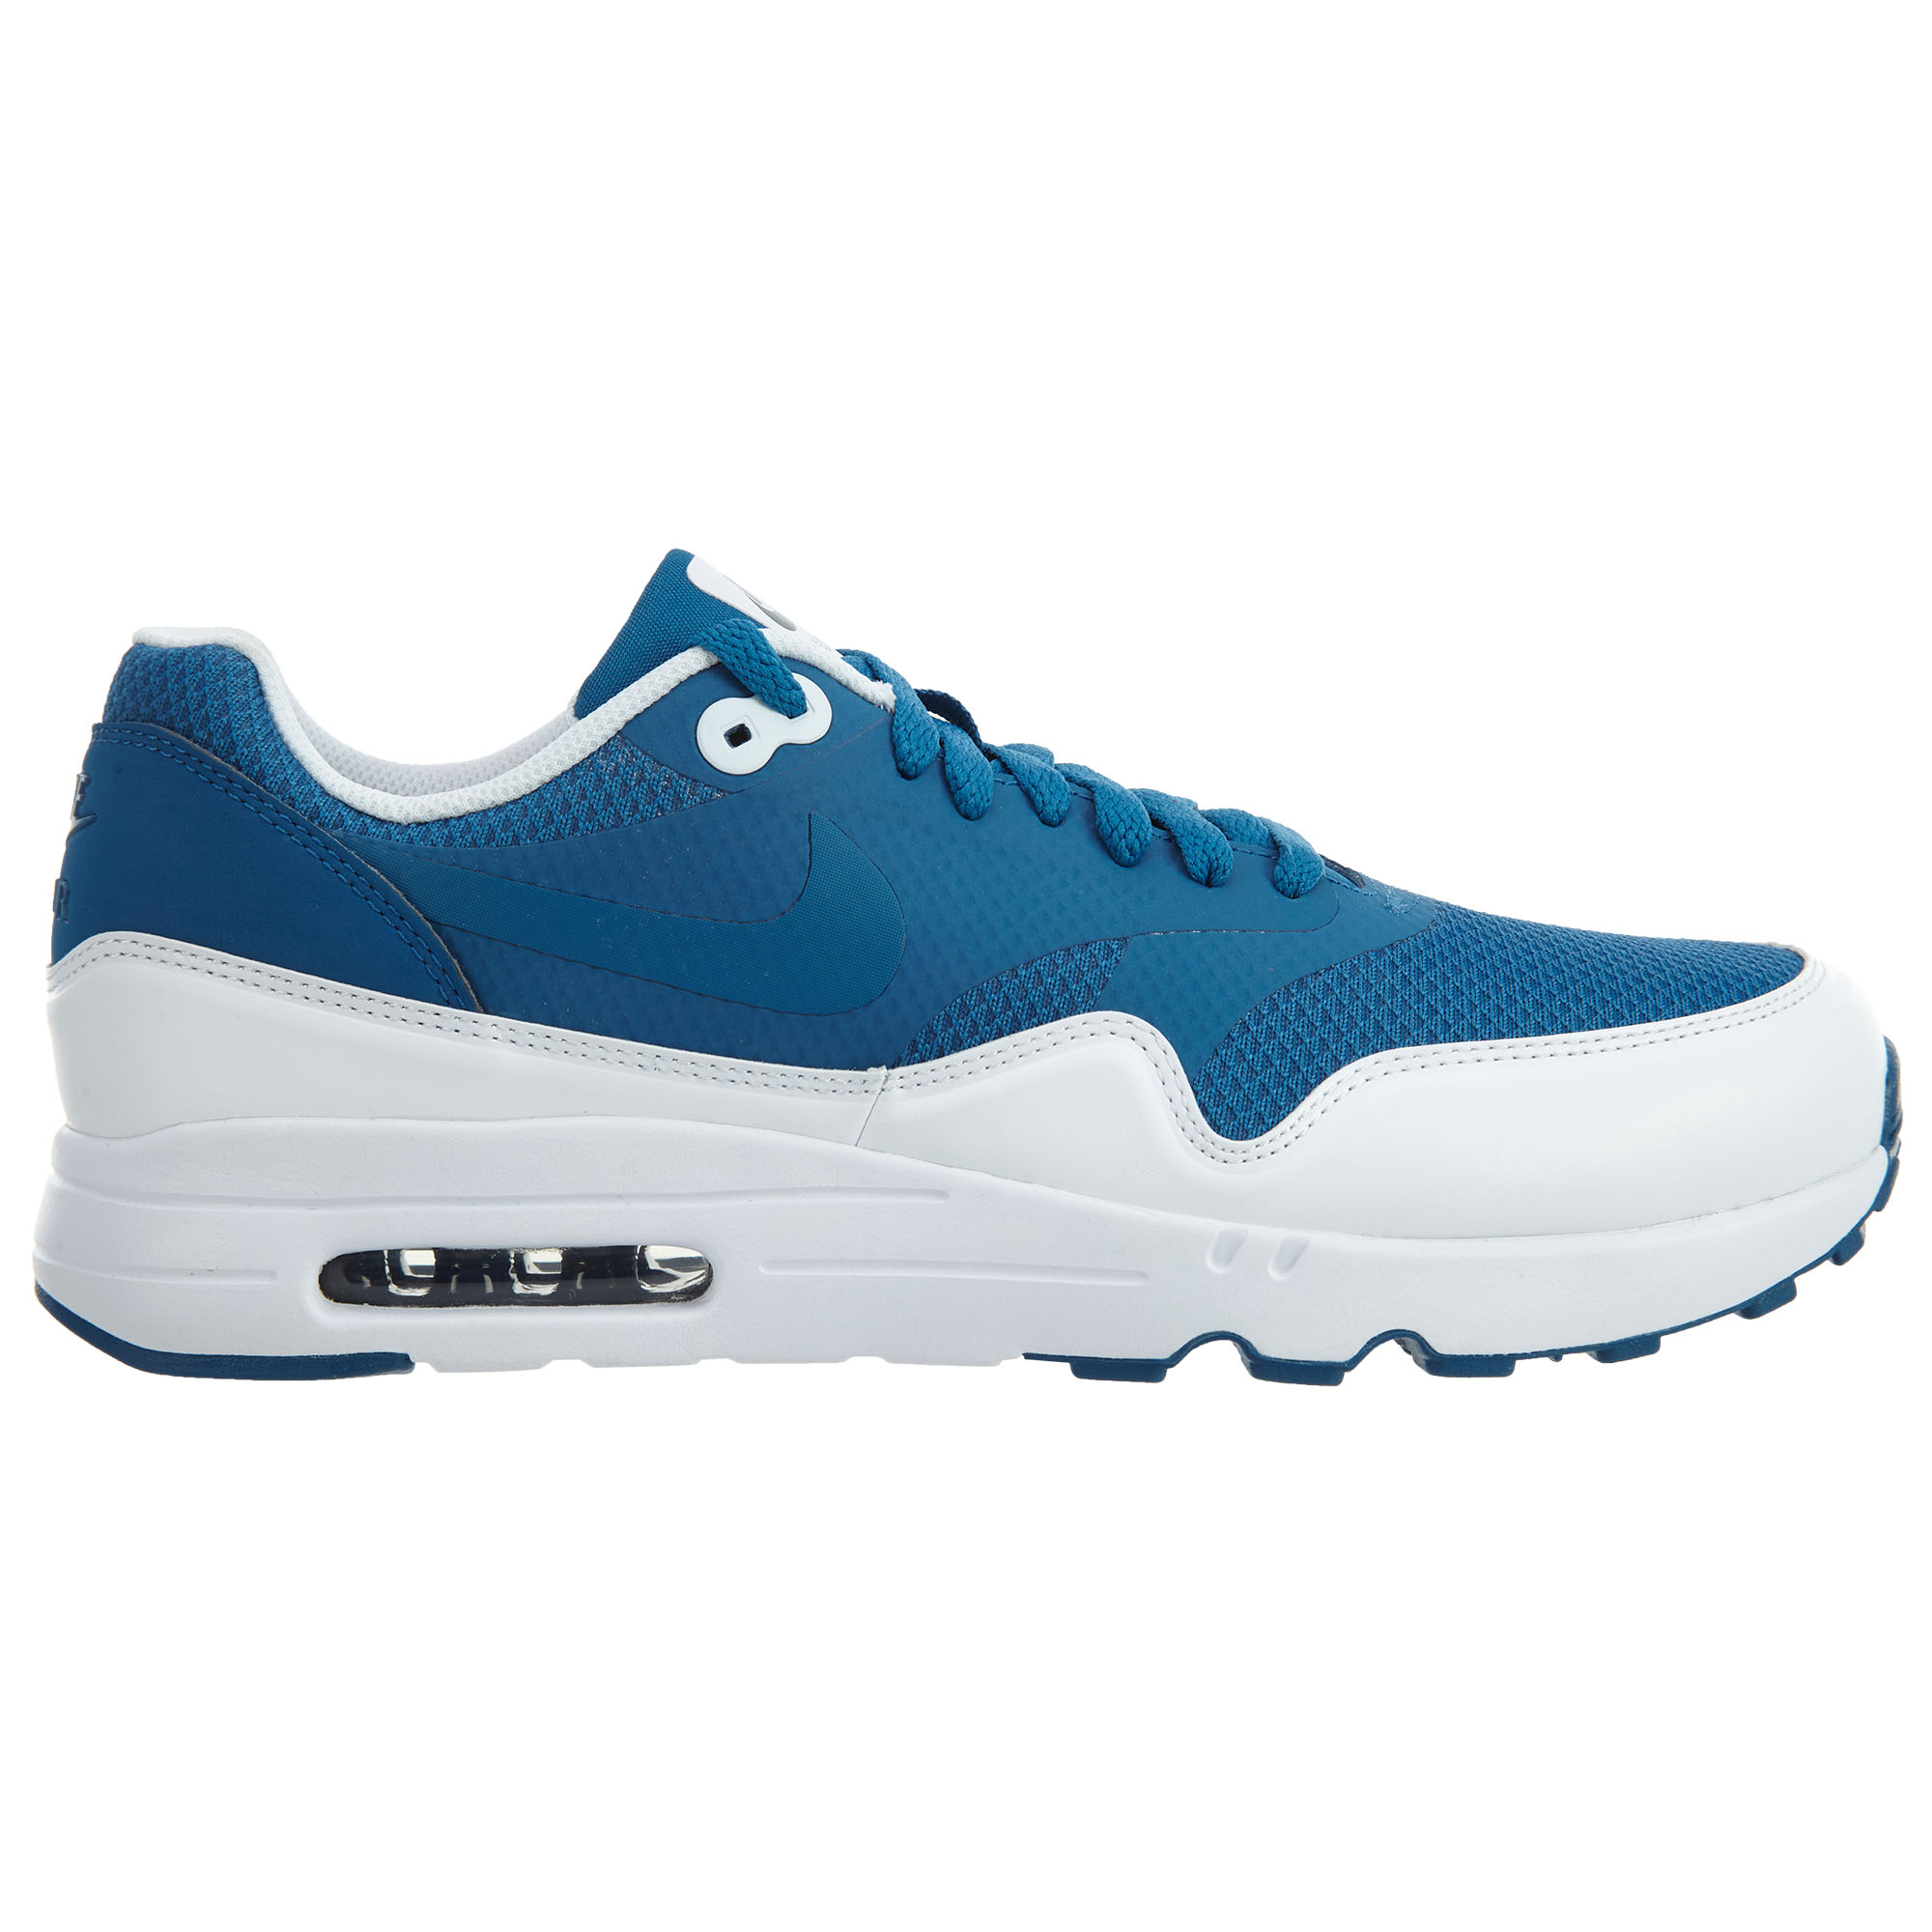 Nike Air Max 1 Ultra 2.0 Essential Industrial Blue - 875679-402